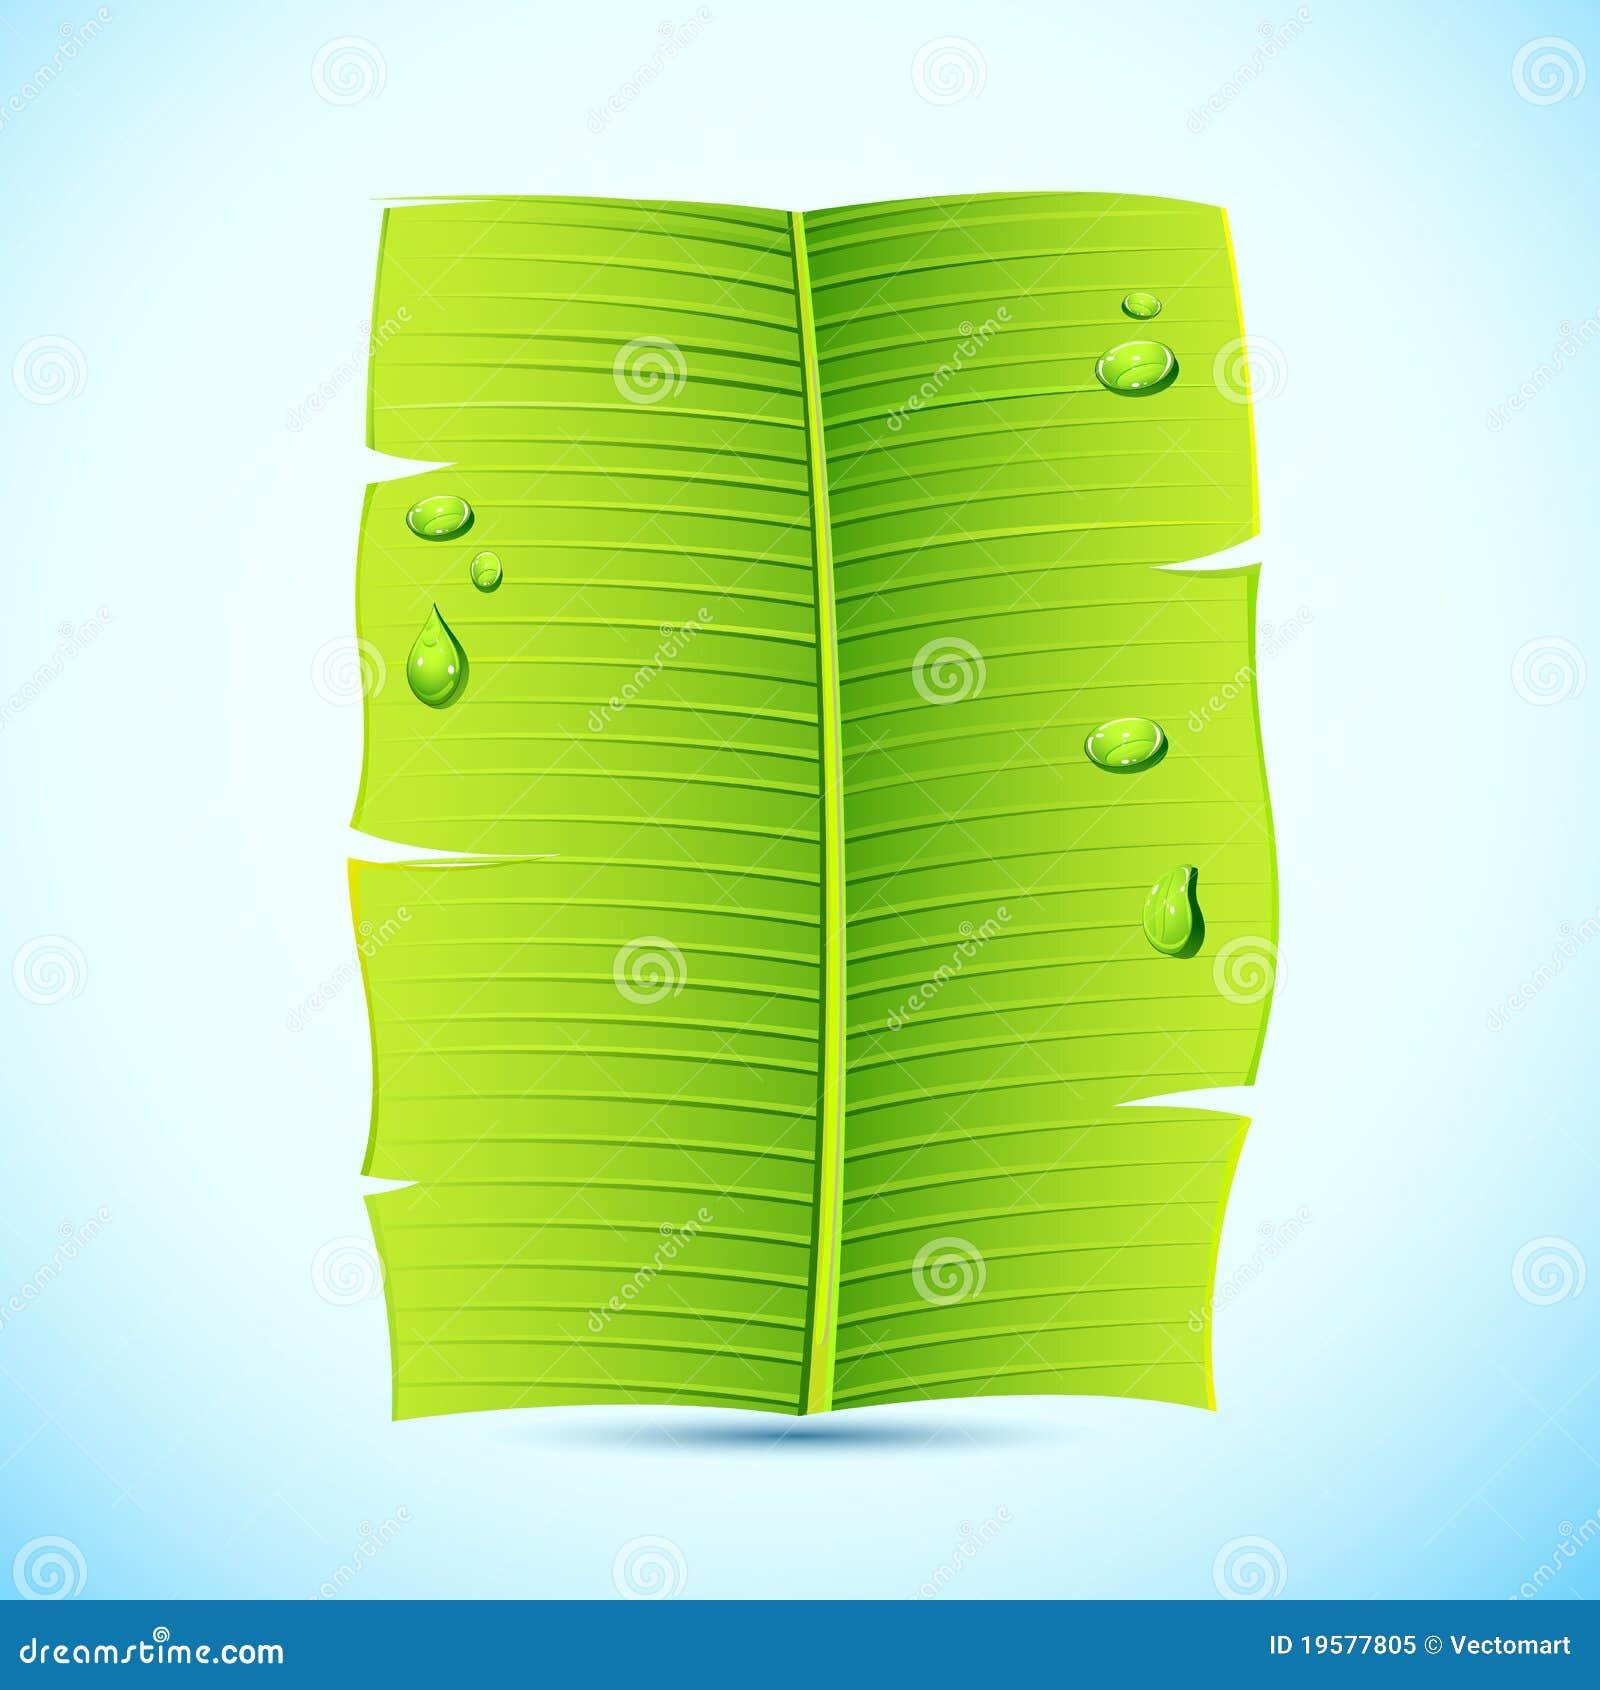 Banana Leaf Invitation Letter Royalty Free Stock Photo ...